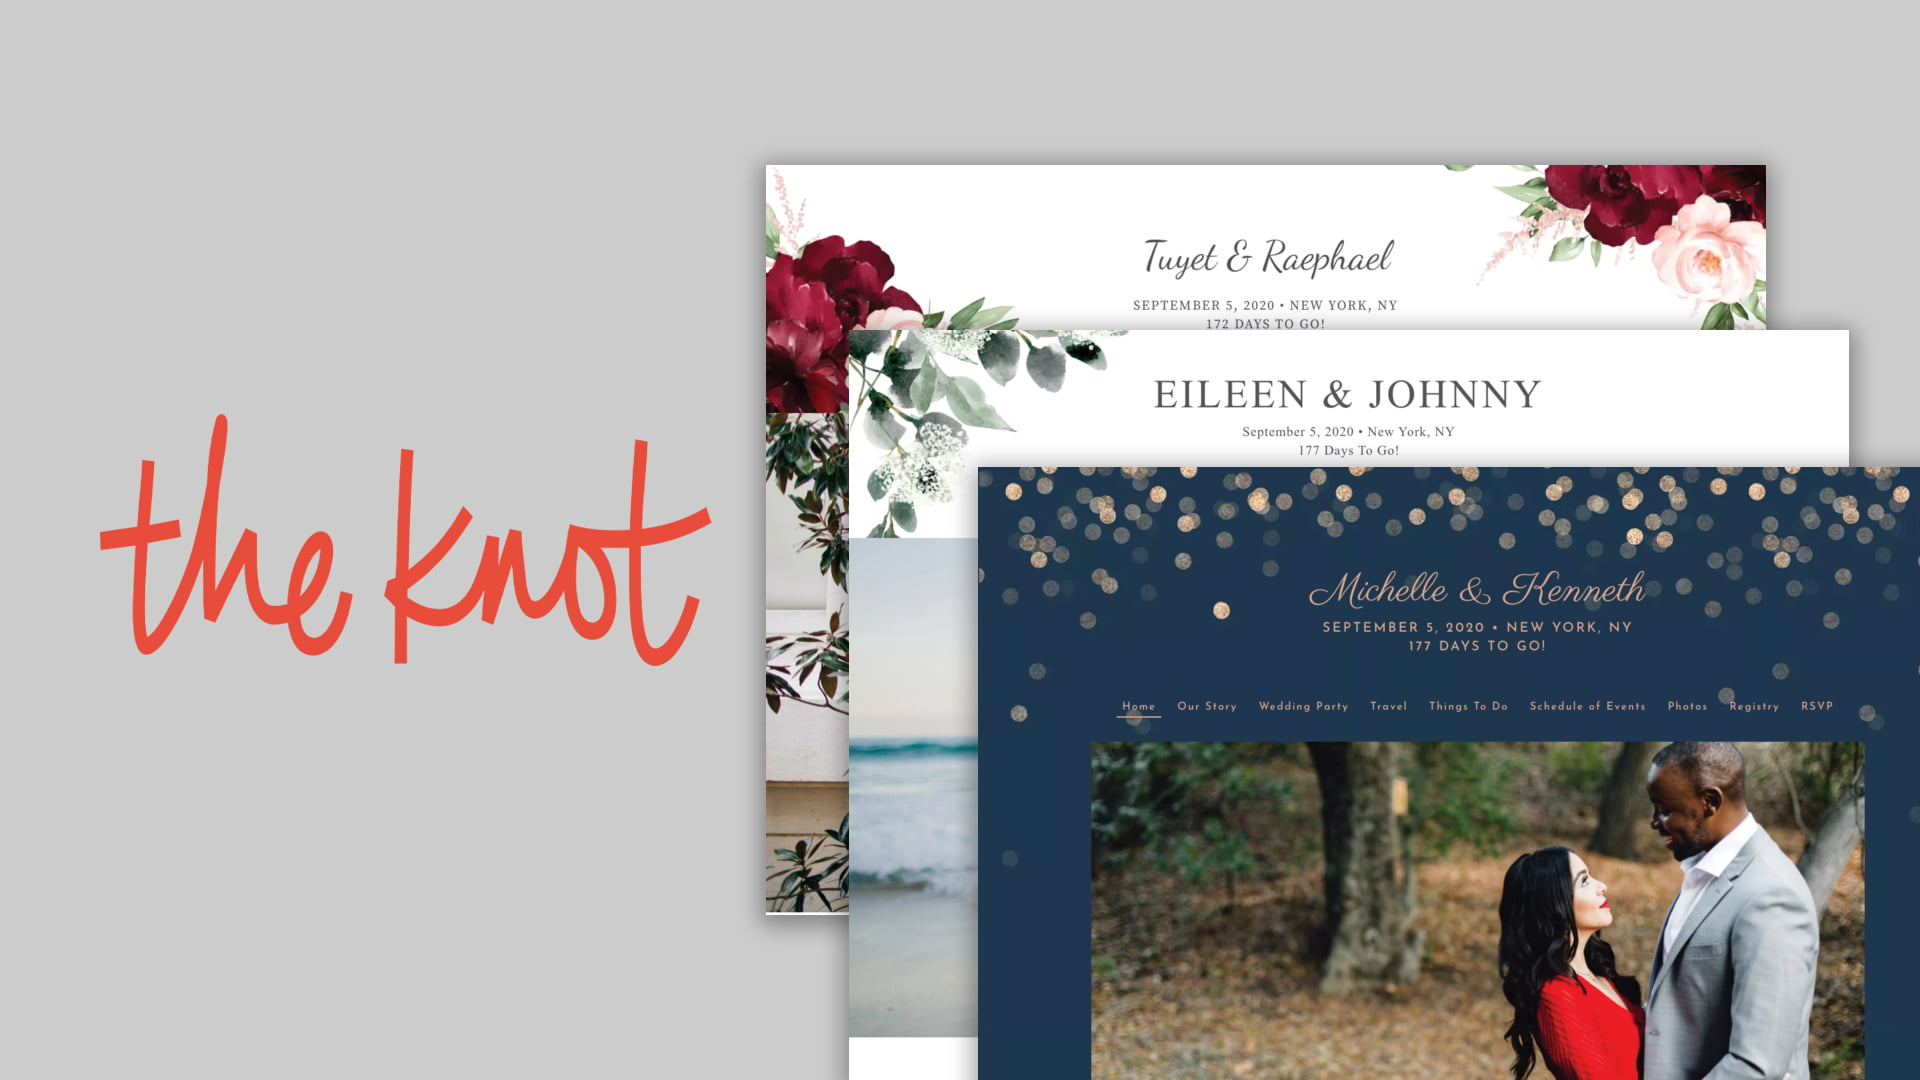 wedding website builder: theknot.com